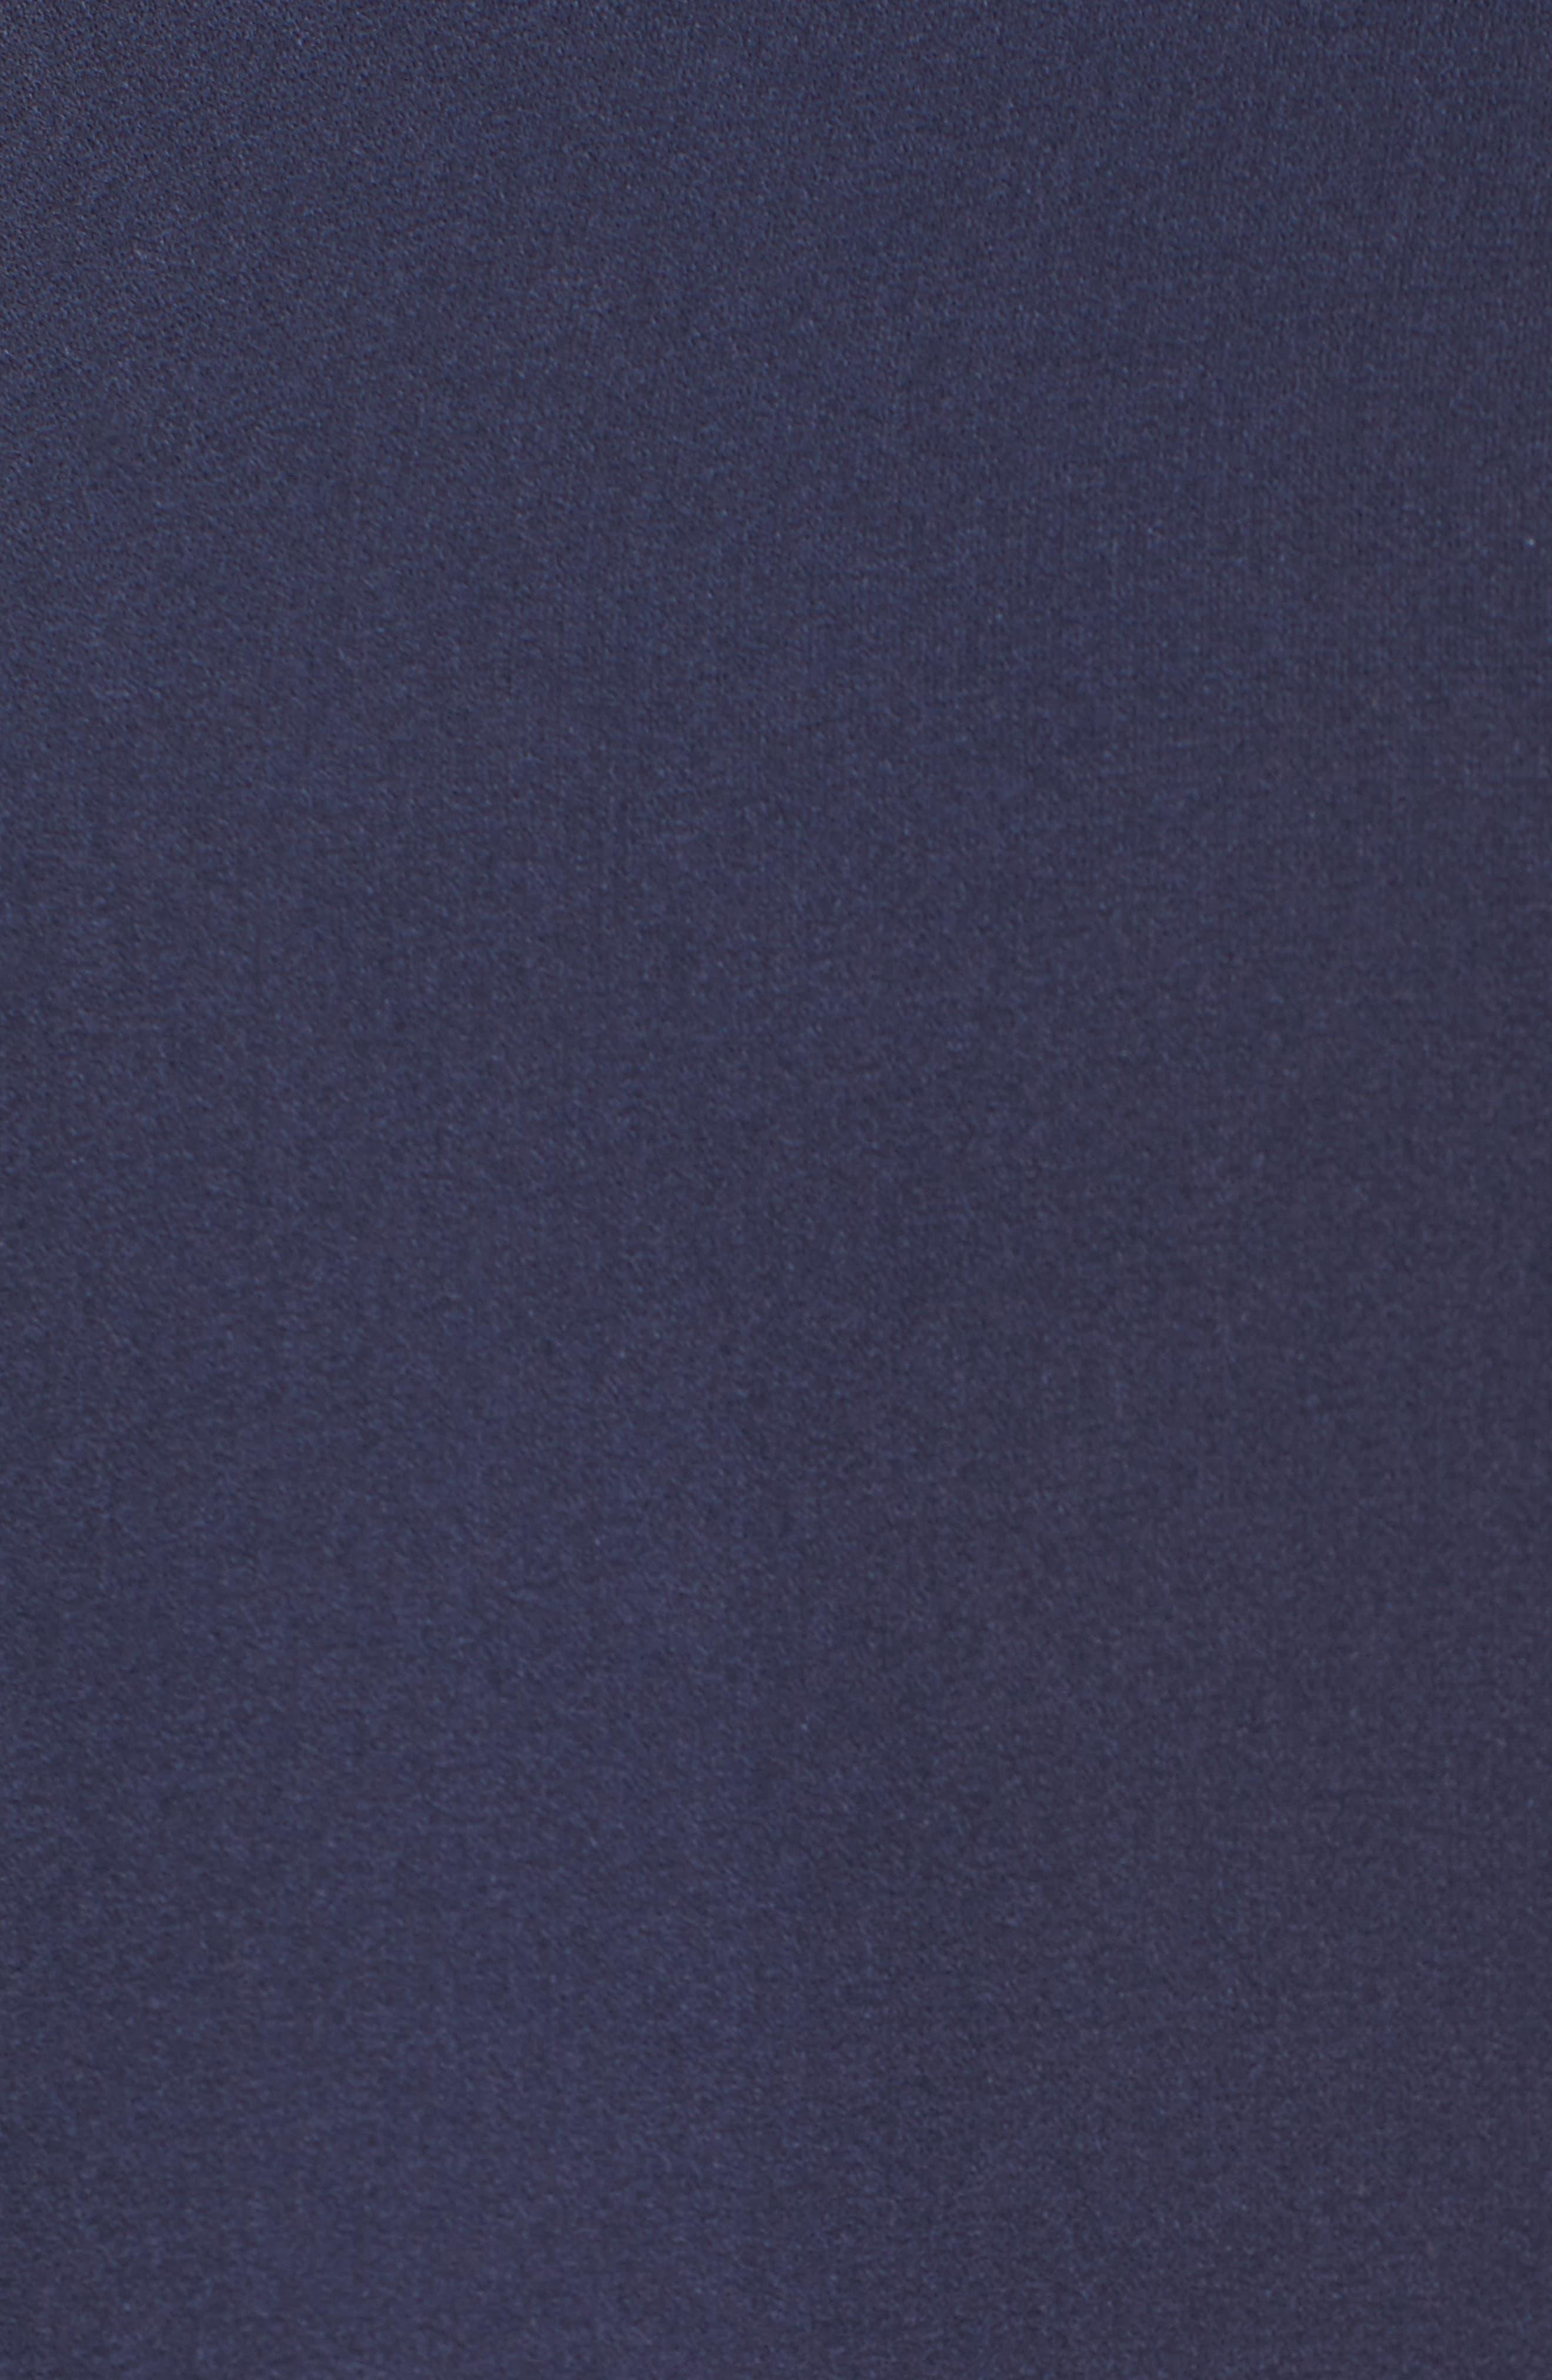 Roll Neck Ruffle Dress,                             Alternate thumbnail 6, color,                             410